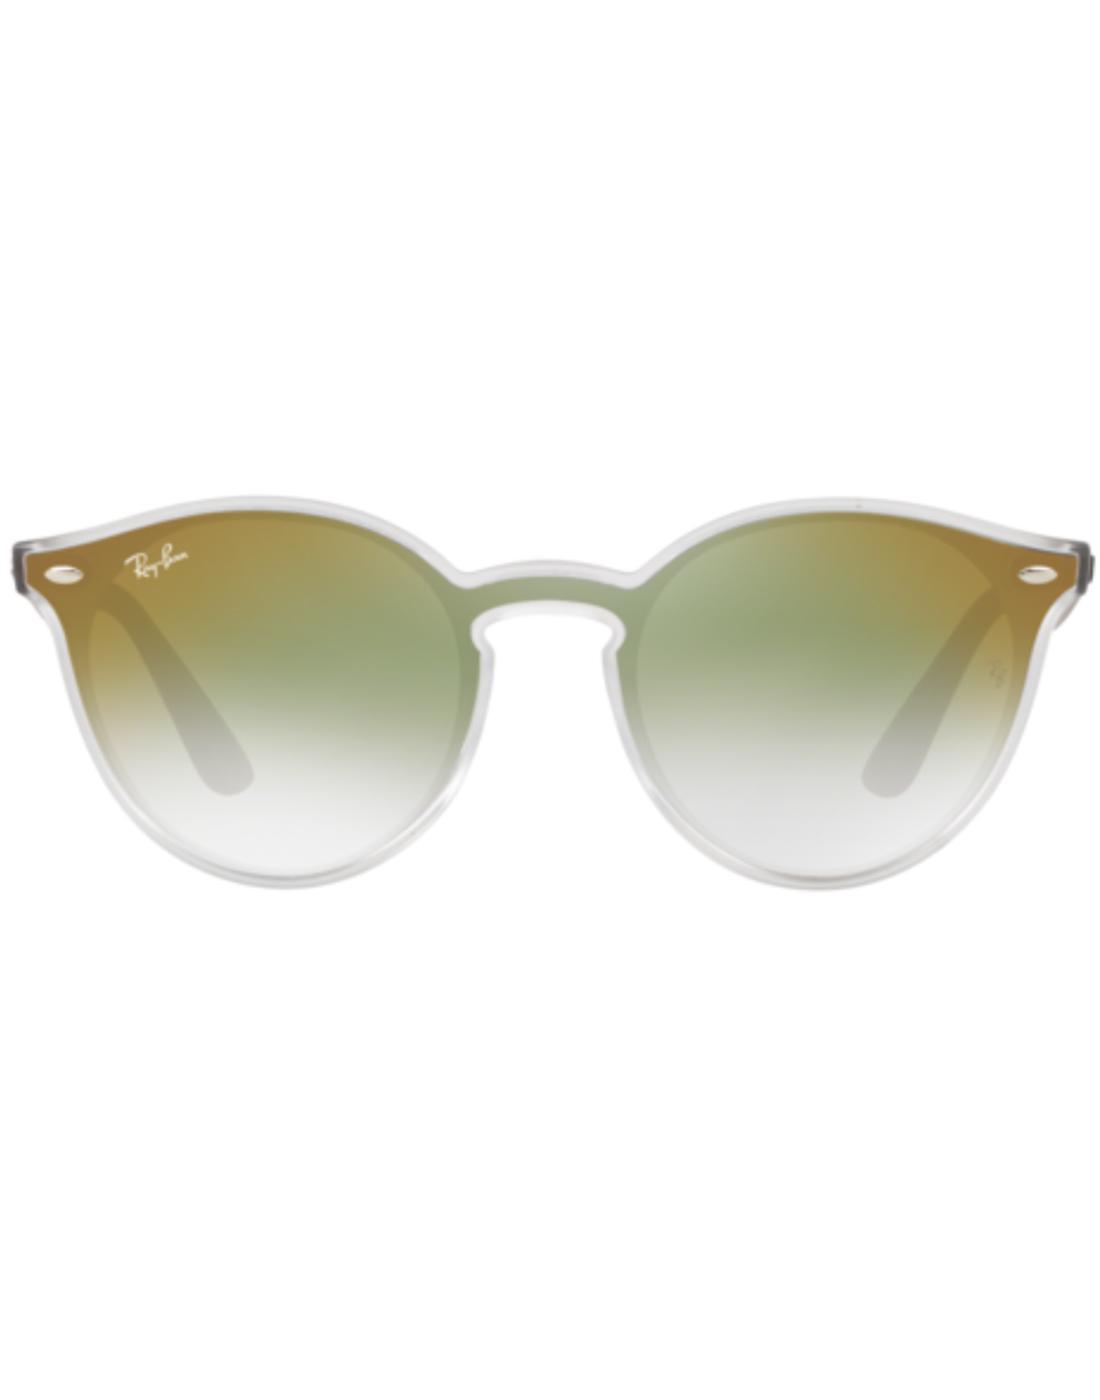 Blaze Clubround RAY-BAN Mirror Sunglasses Green